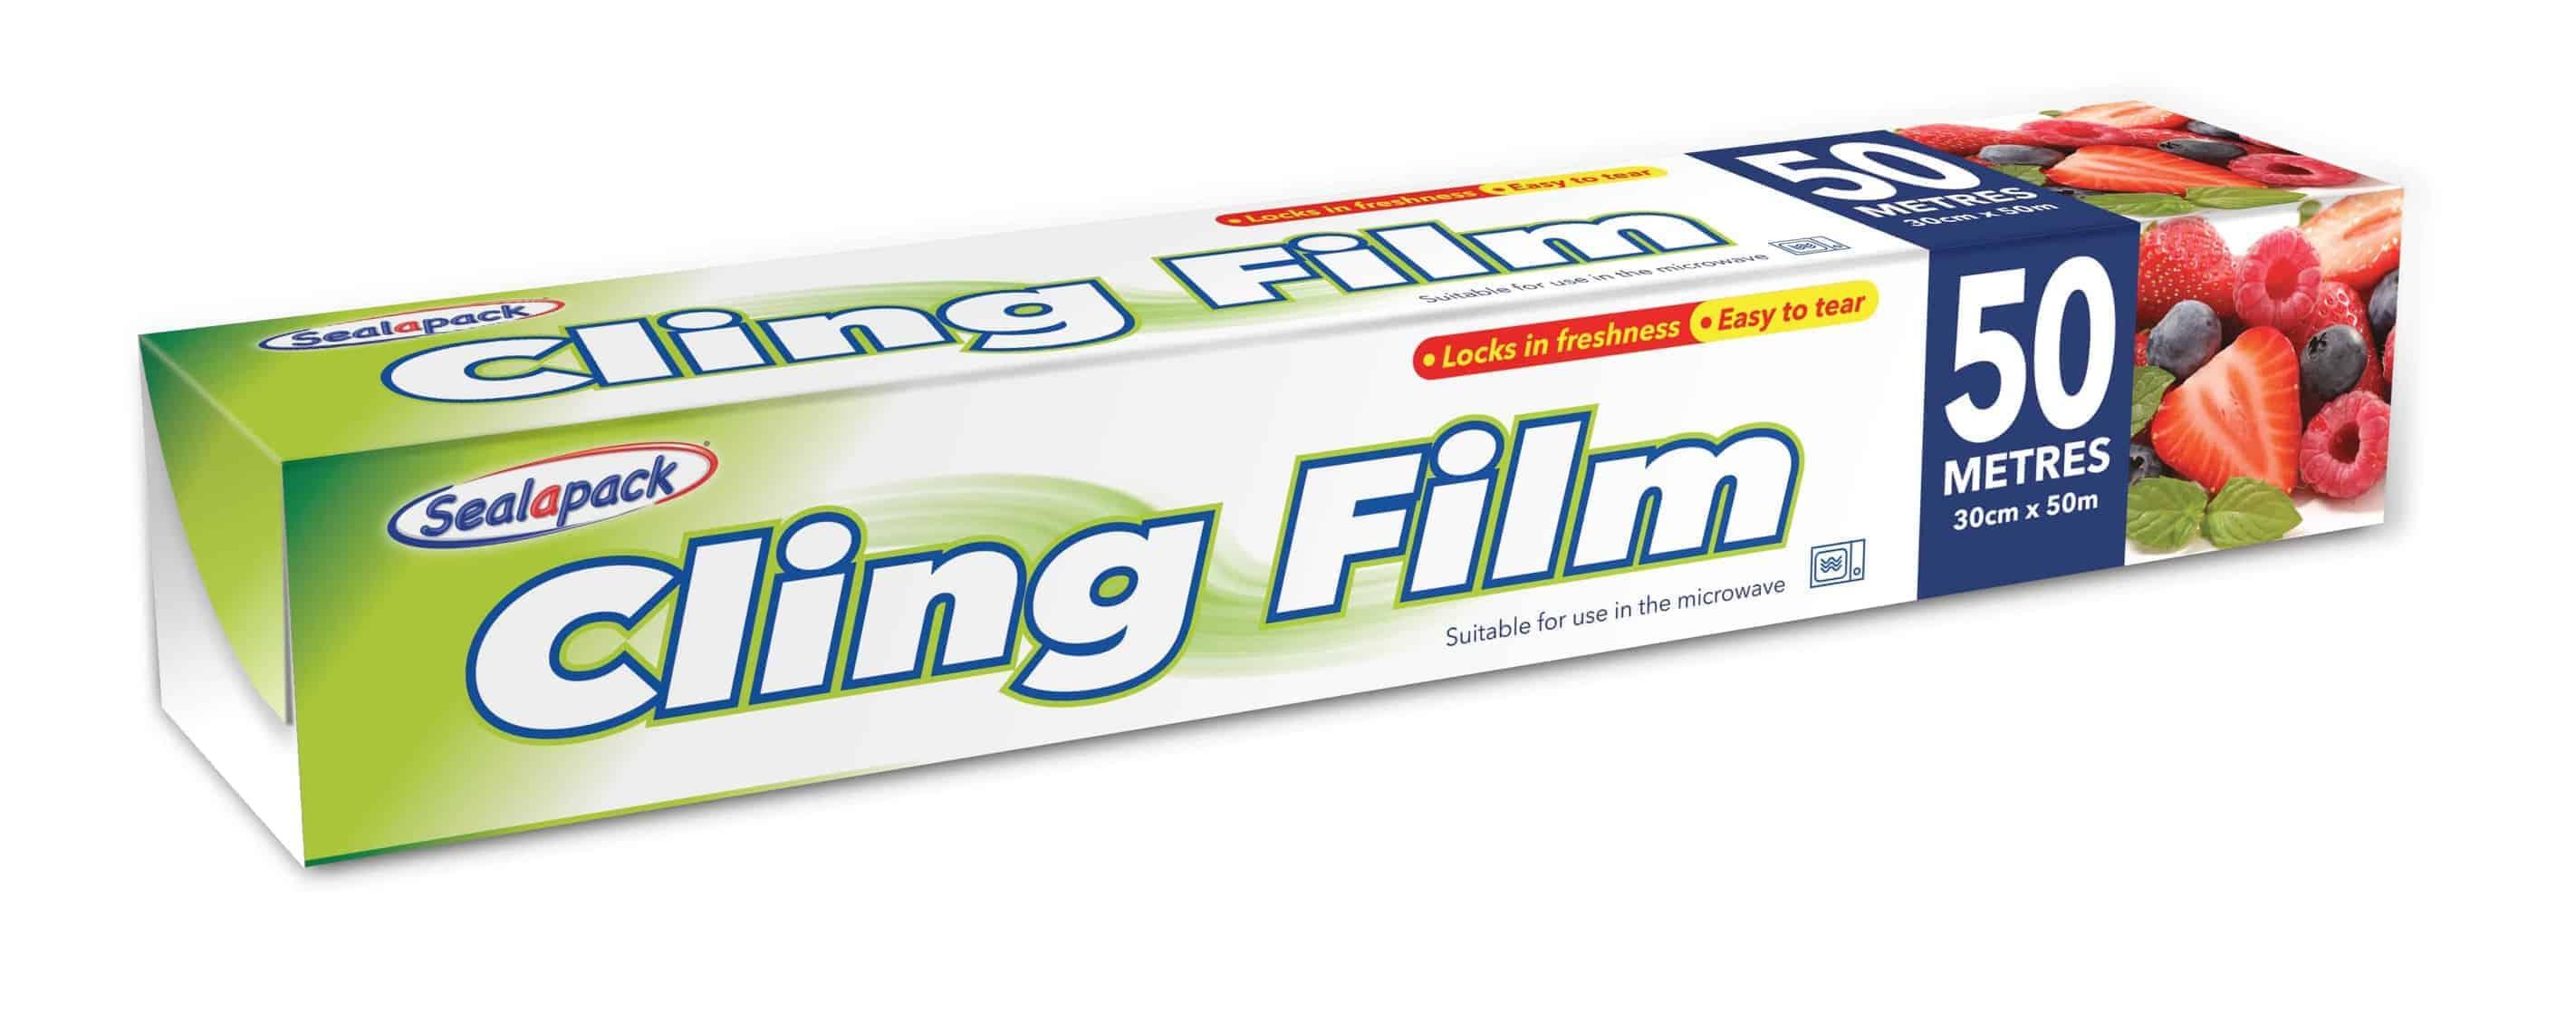 Sealapack 30x60m Cling Film